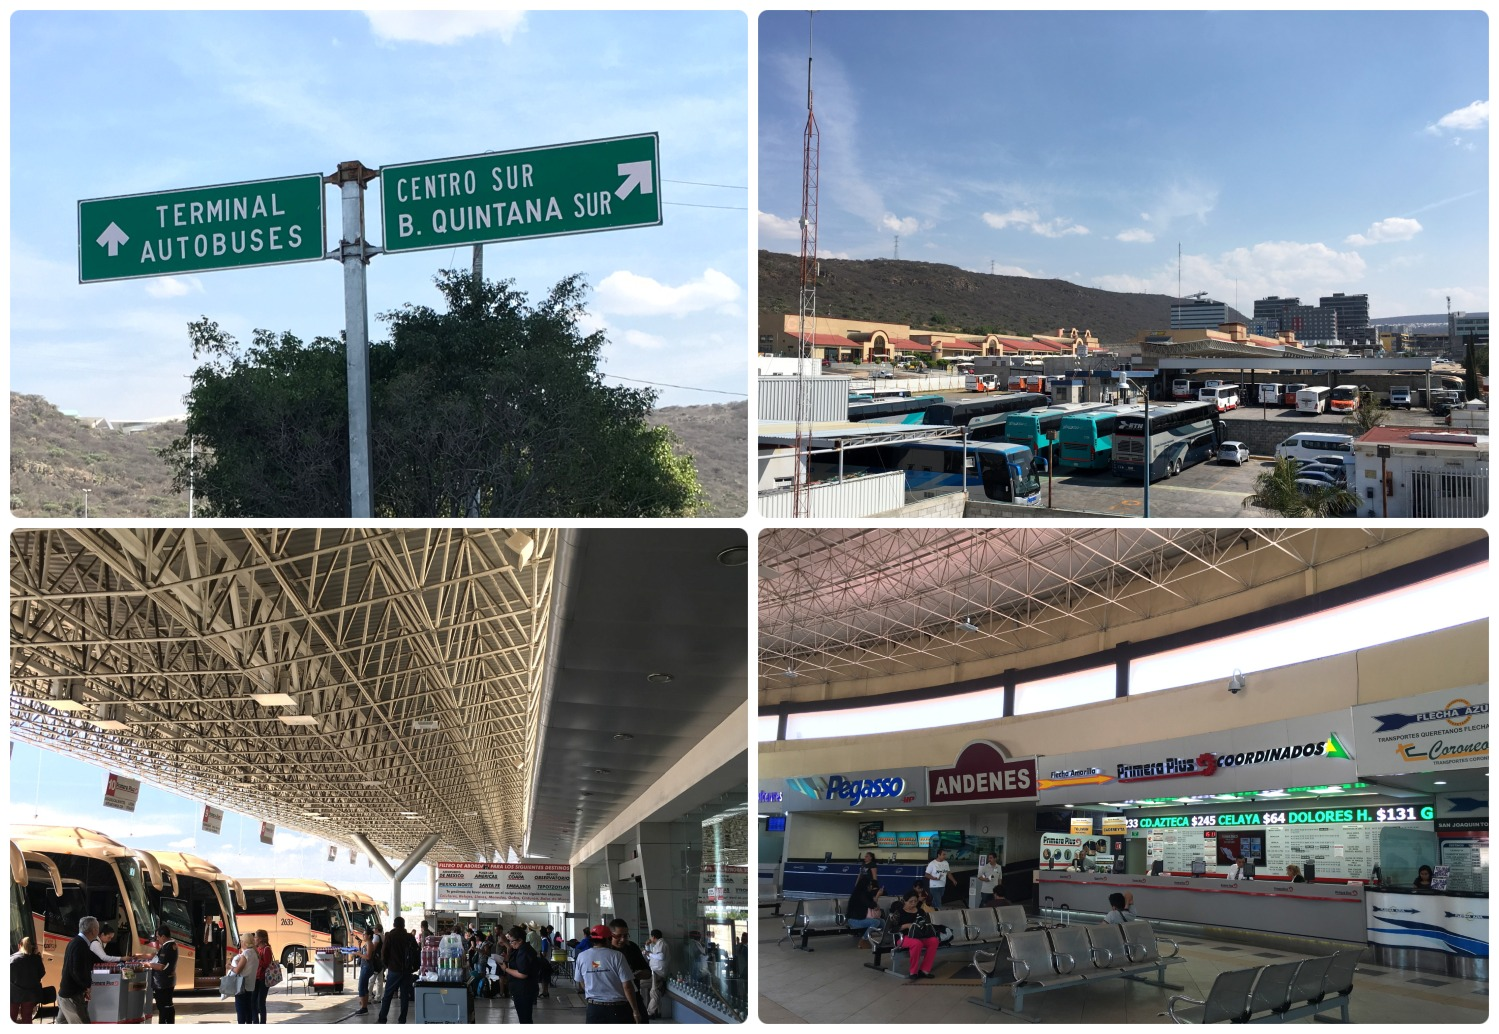 The Santiago de Queretaro, Meixco bus terminal is near the stadium (Estadio Corregidora) and is a busy transportation hub.